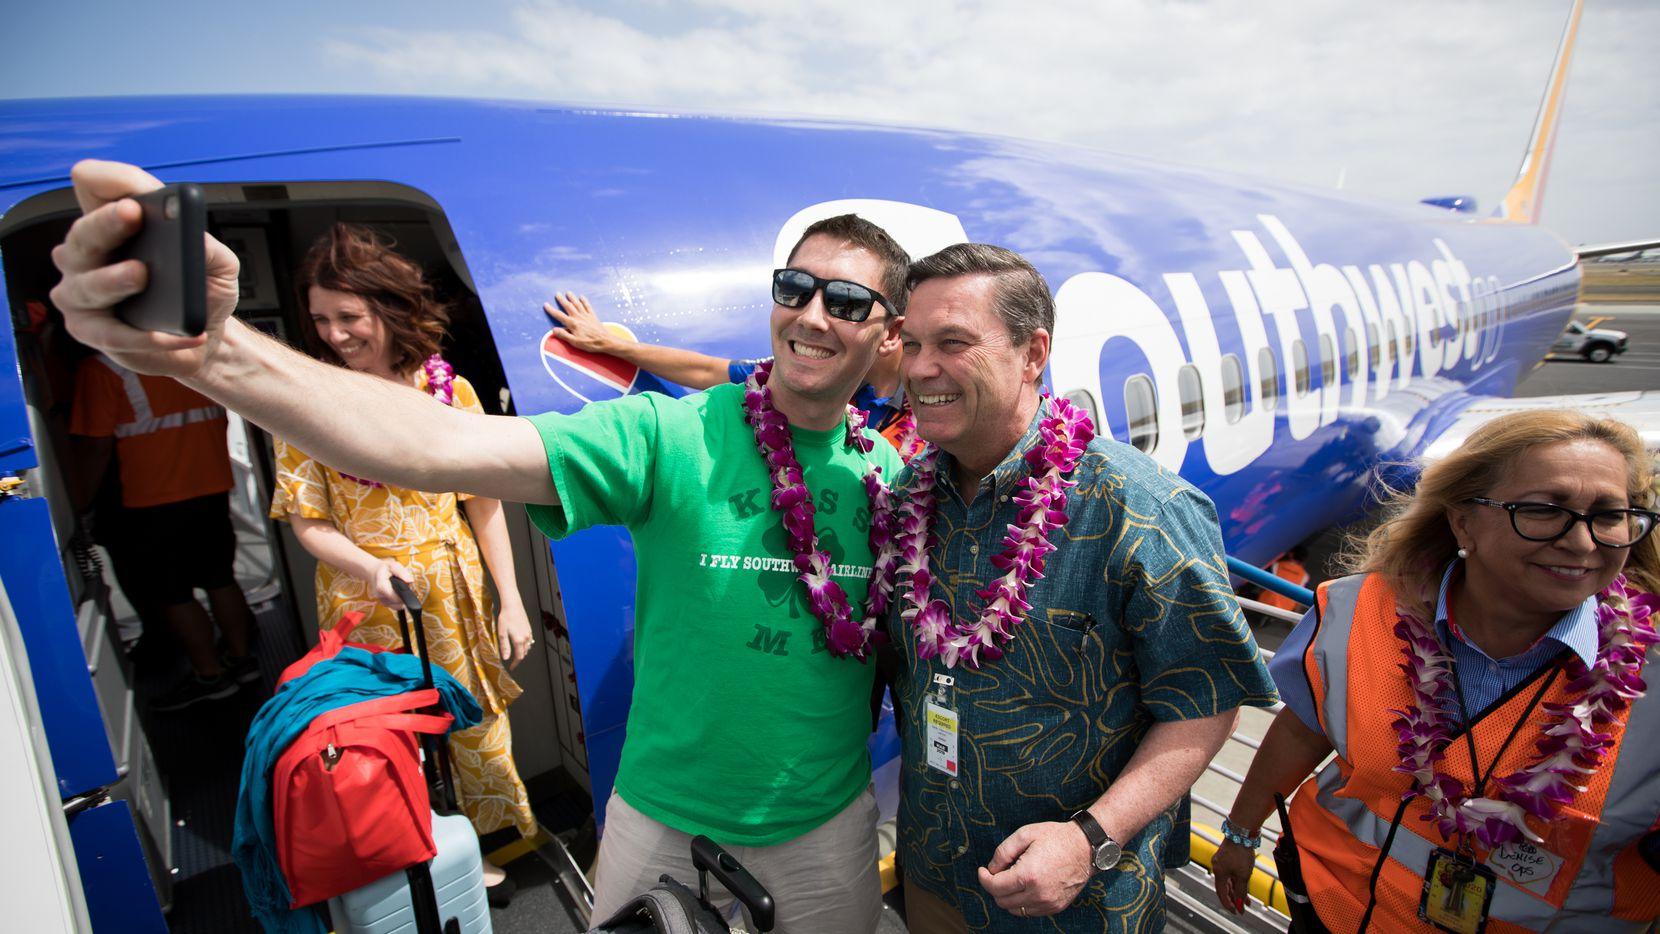 Southwest Airlines President Tom Nealon greets arriving passengers on the inaugural flight to Hawaii touches down in Daniel K. Inouye International Airport in Honolulu. // Stephen M. Keller, 2019